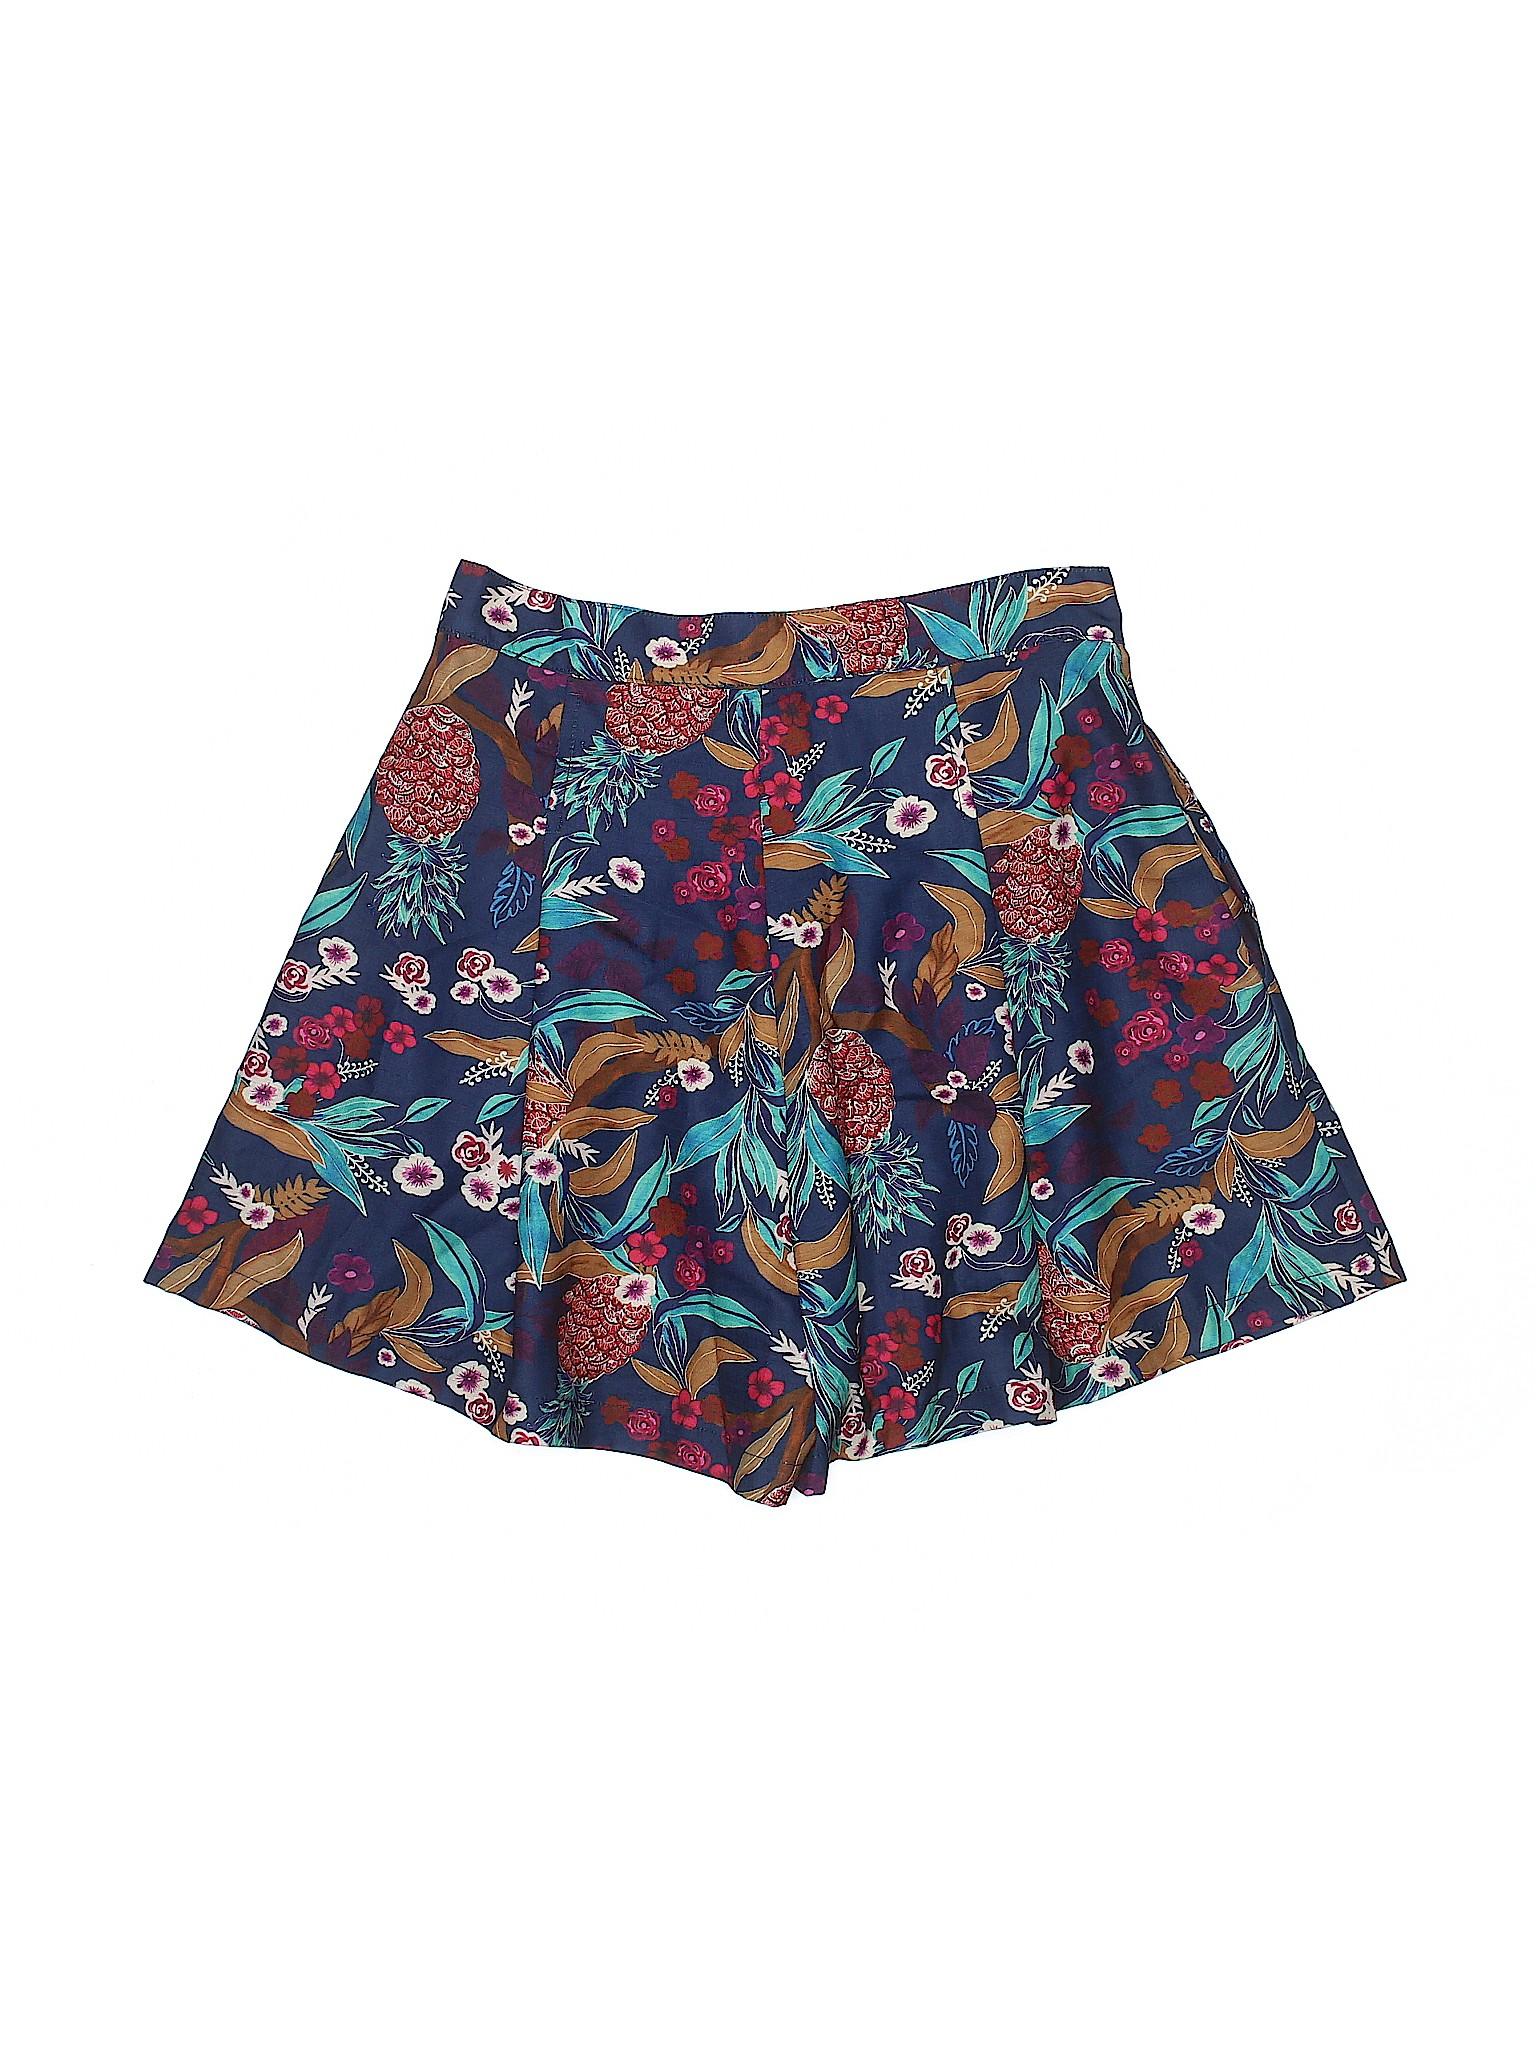 Shorts Beautiful Boutique amp; Bright Company x44nqrIE